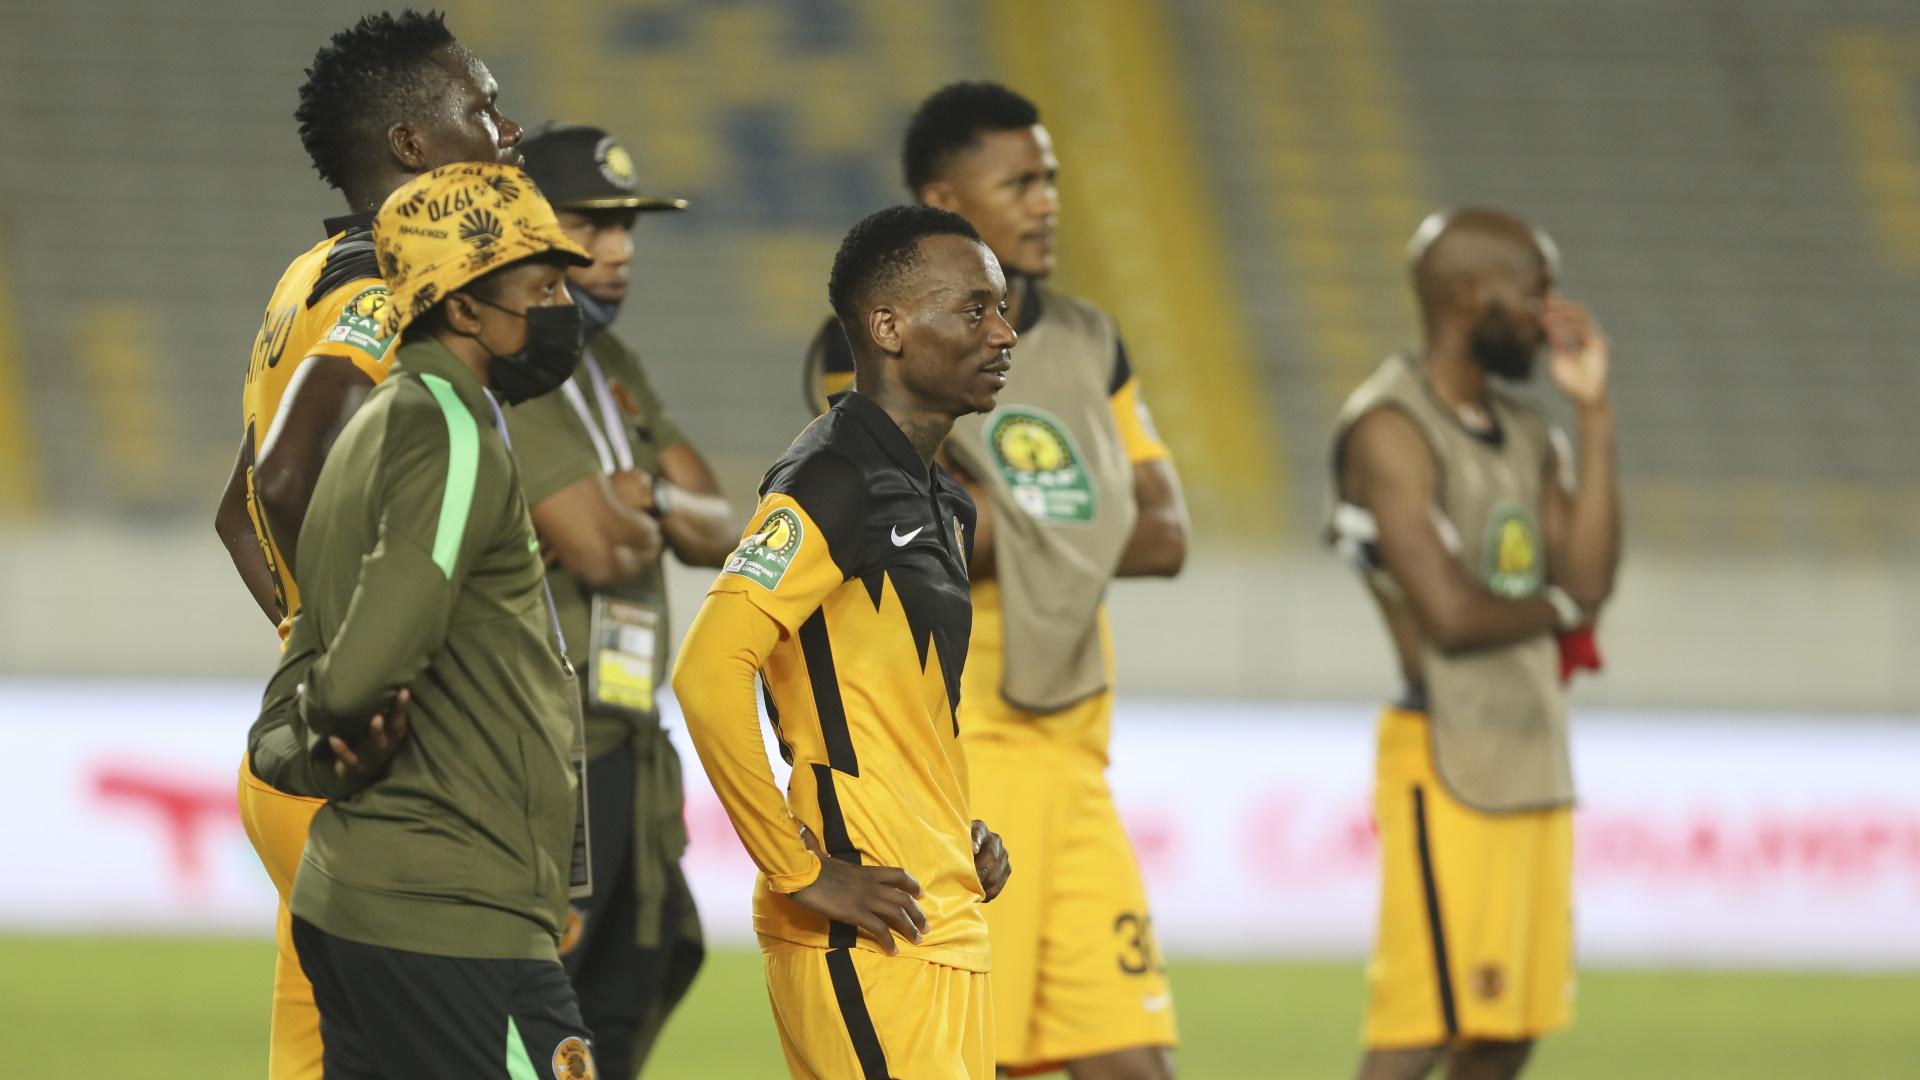 Revealed: Kaizer Chiefs XI vs Mamelodi Sundowns – Cole, Nange, Sekgota, Hlanti make competitive debut